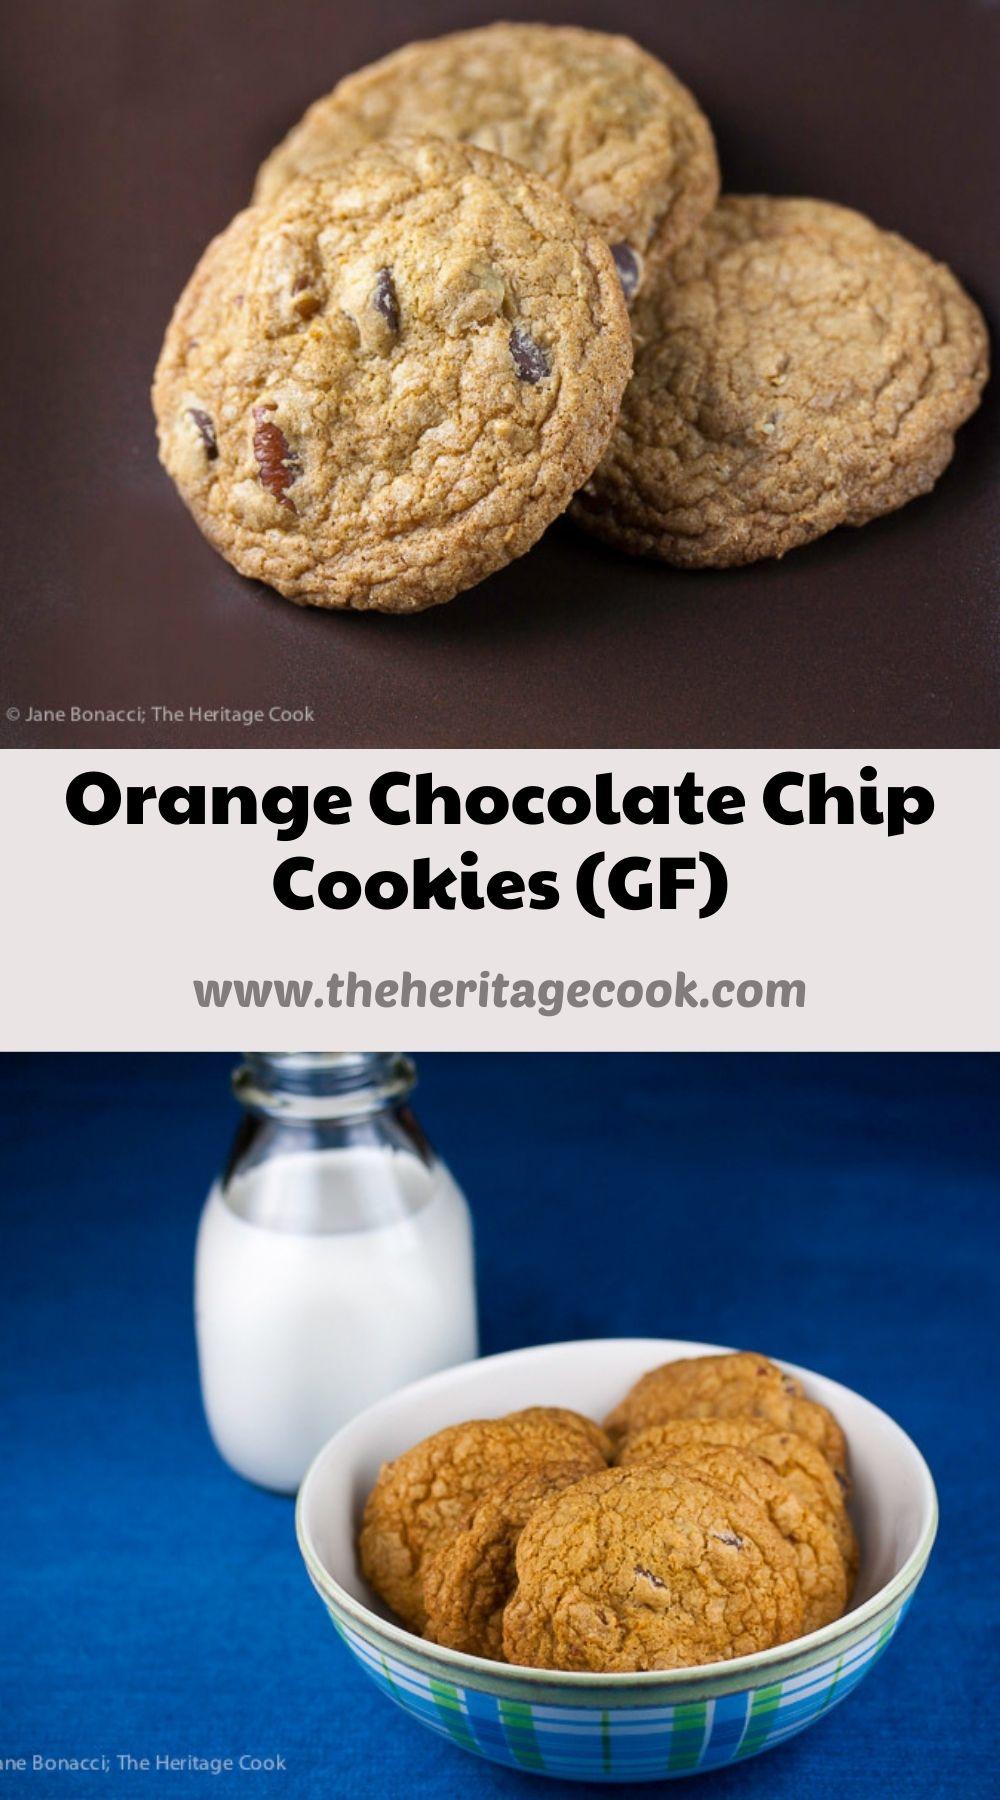 Orange Scented Chocolate Chip Cookies (Gluten Free) © 2021 Jane Bonacci, The Heritage Cook